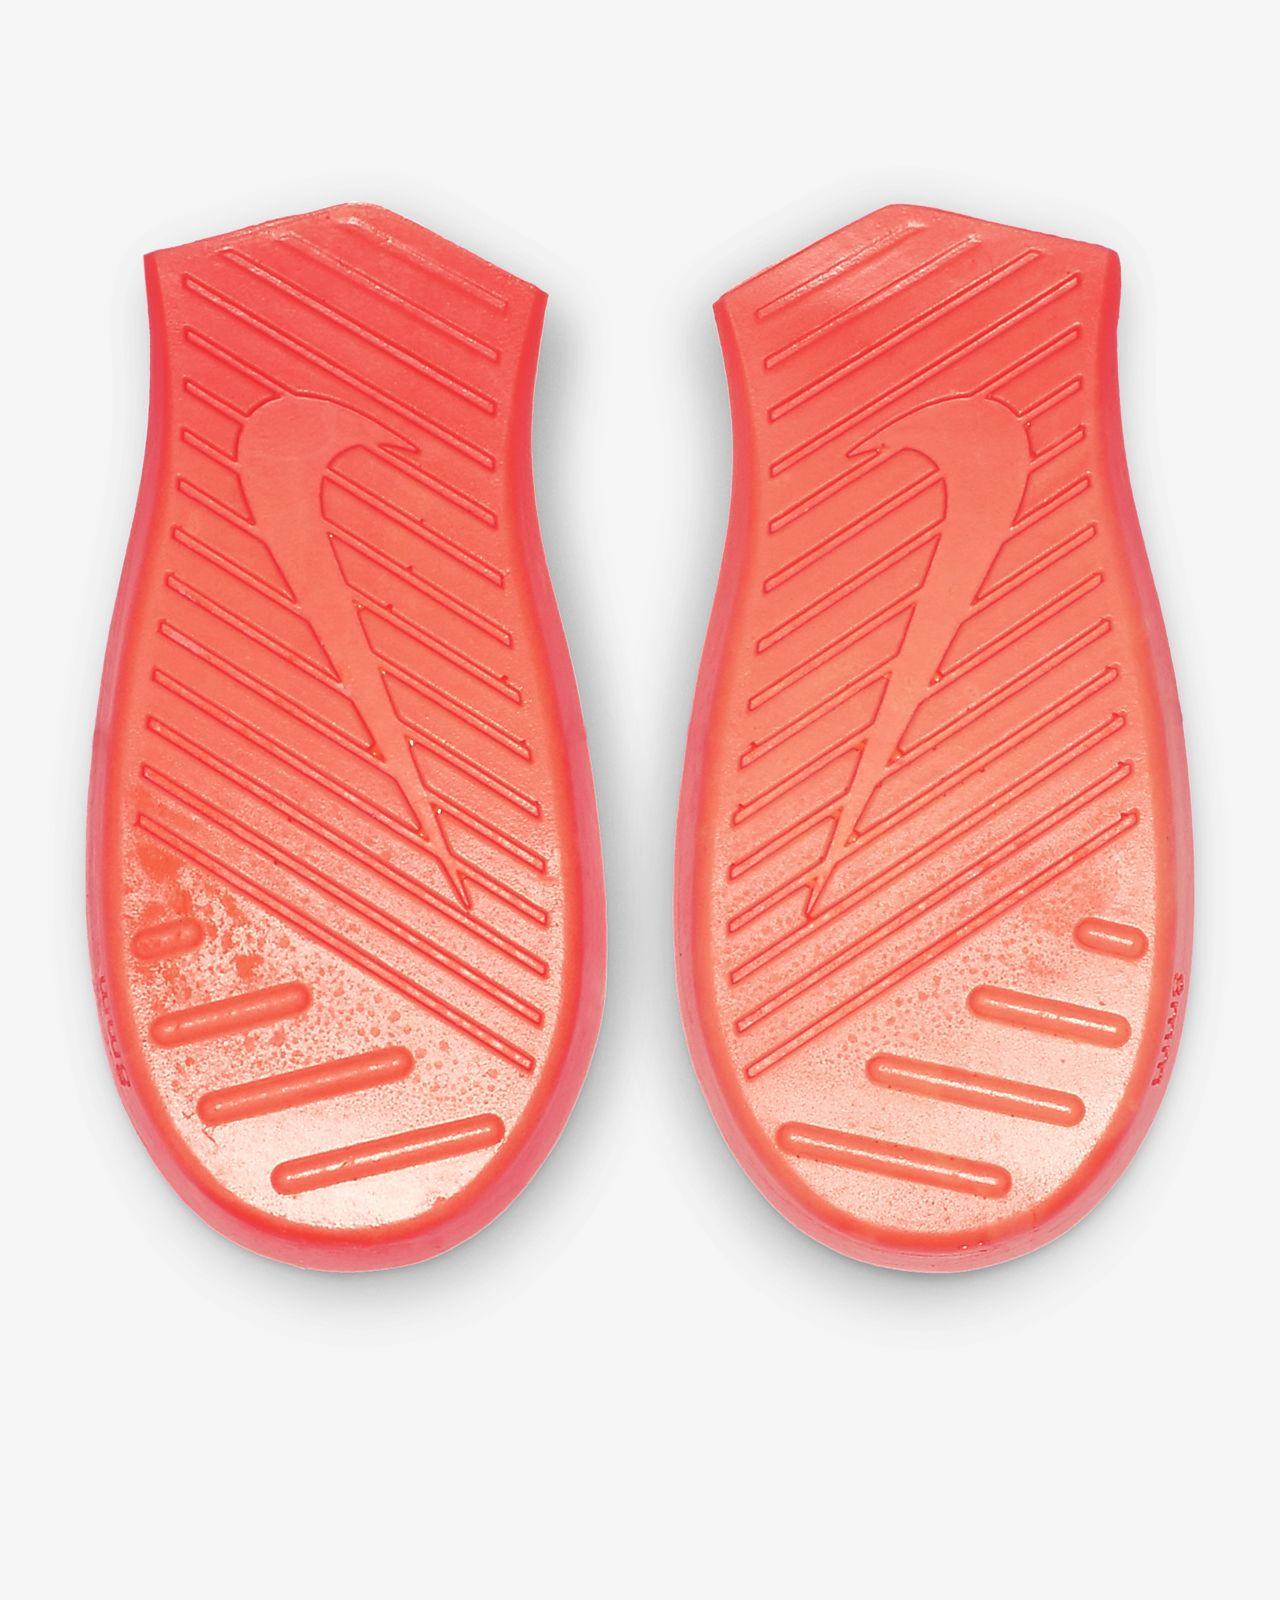 Nike Metcon 5 Medal Strong Nike News